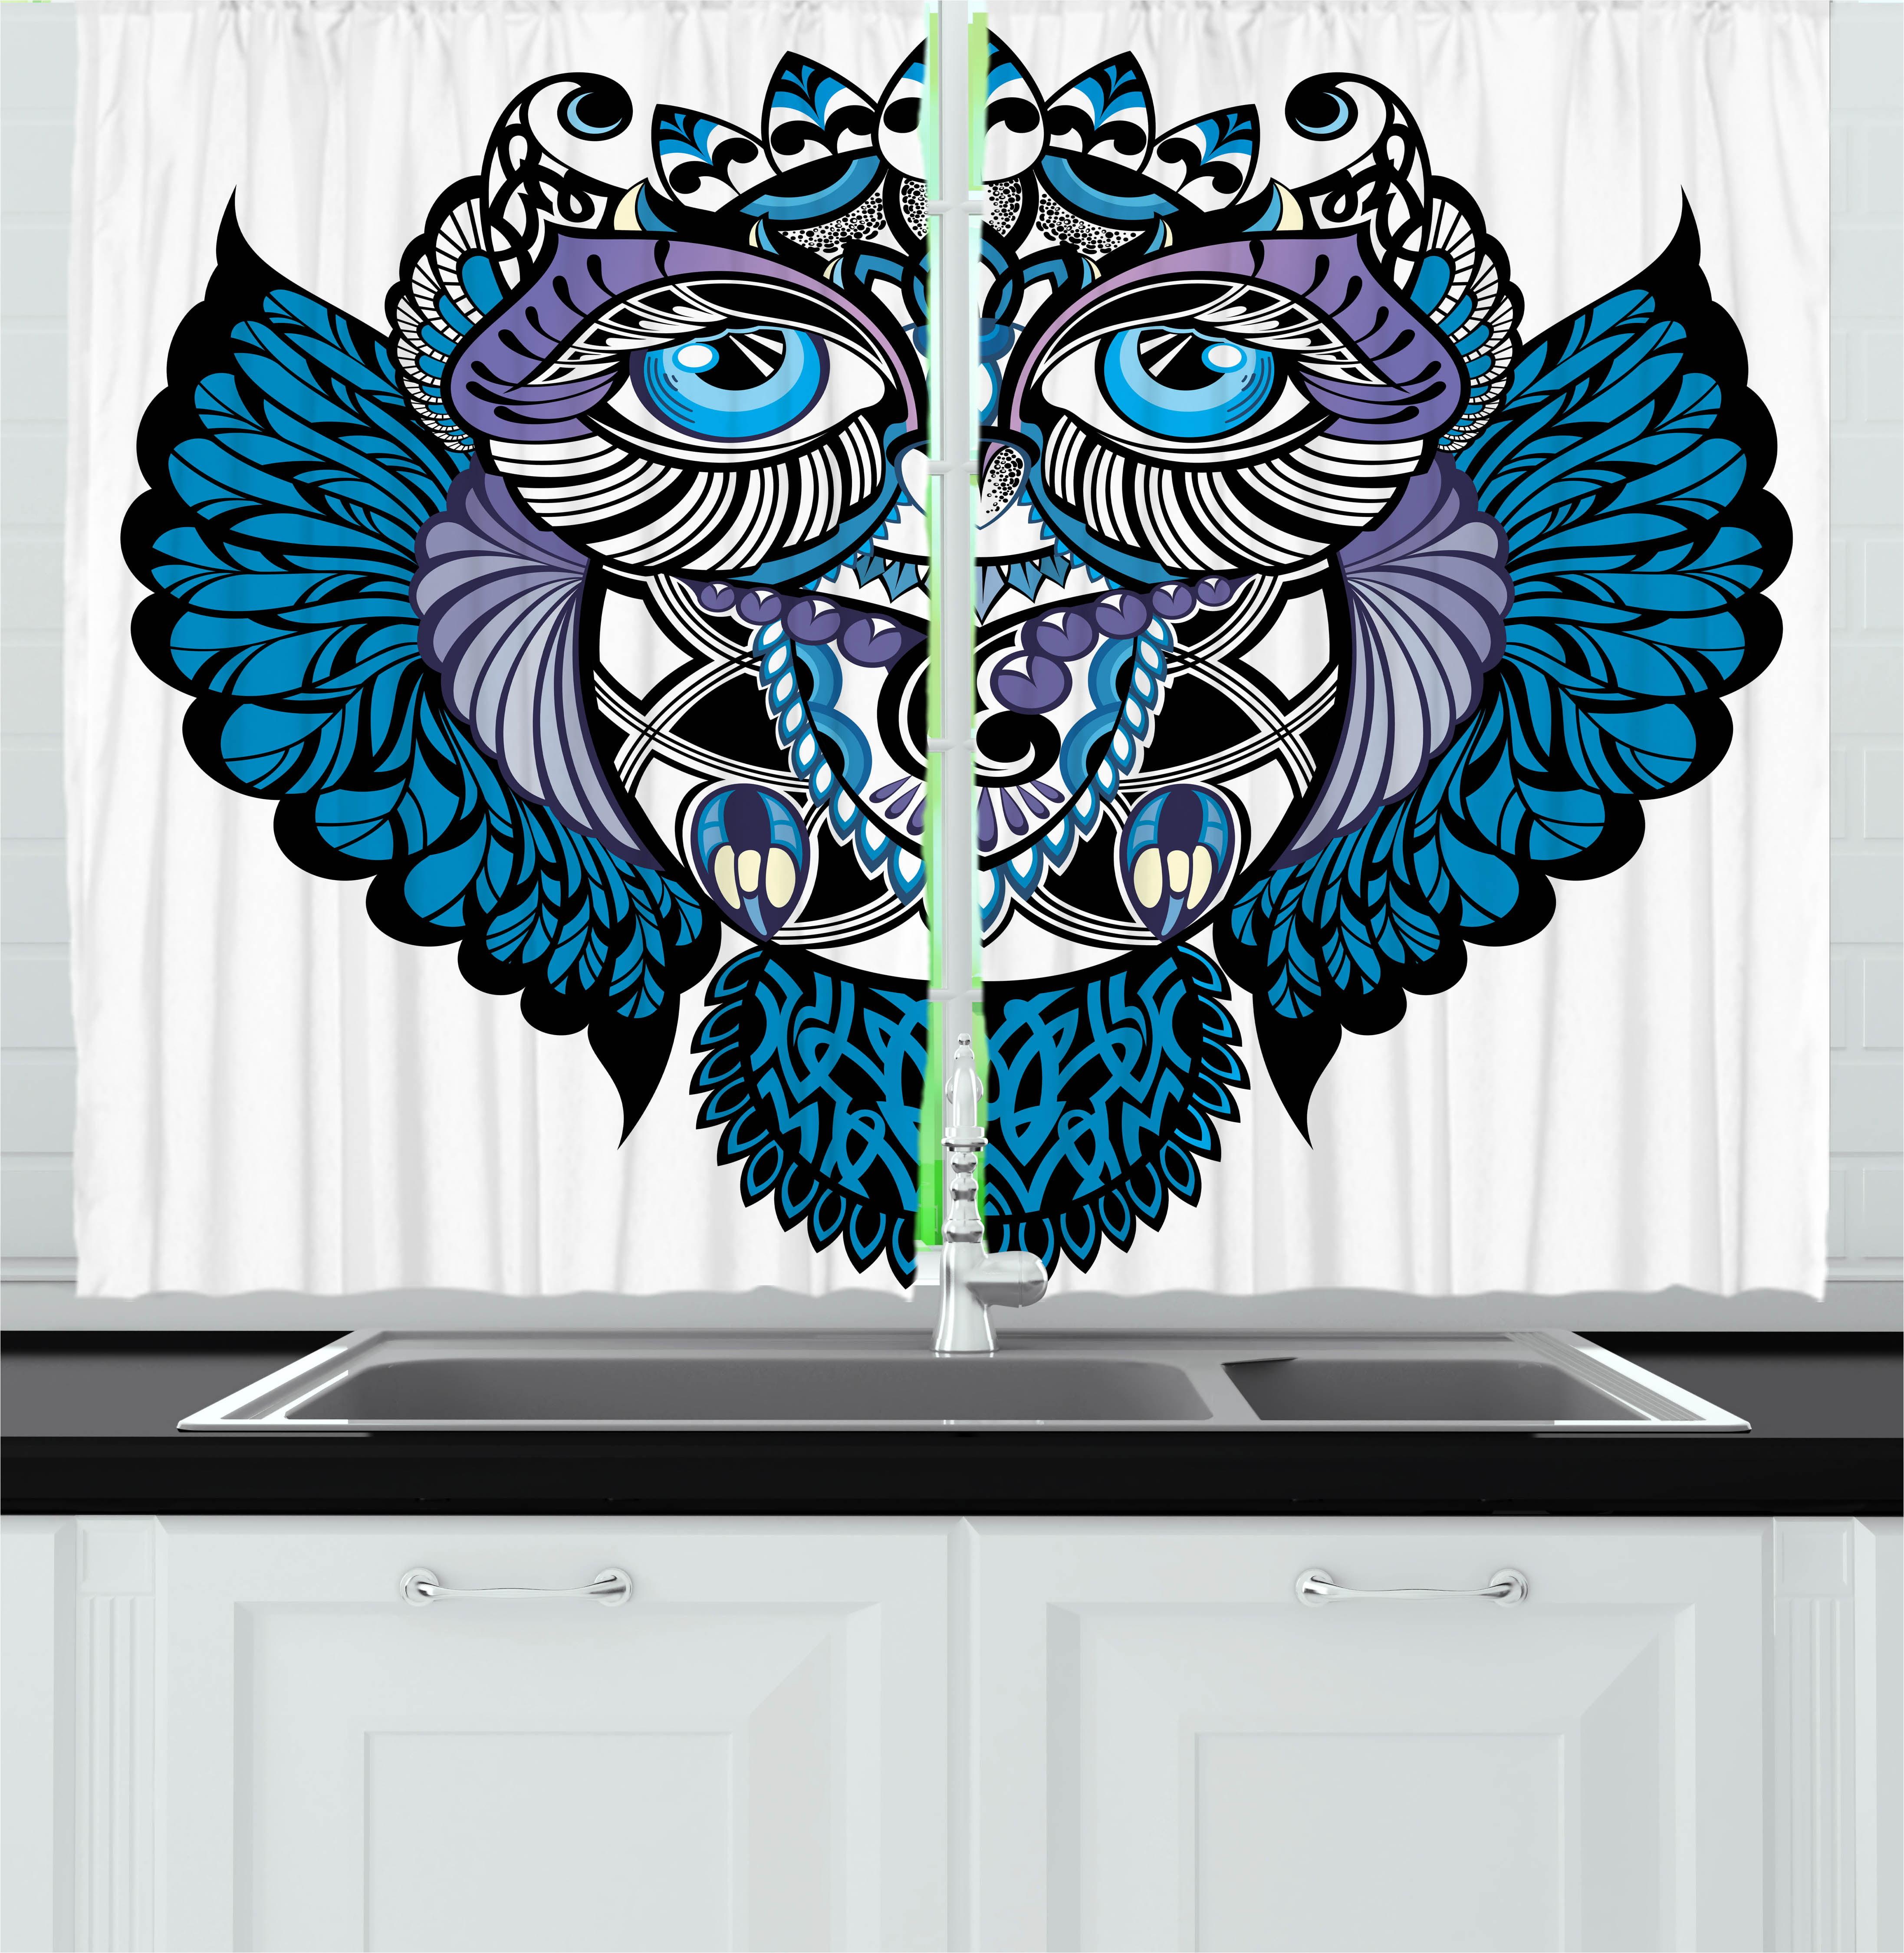 Tribal Curtains 2 Panels Set, Owl Bird Animal With Paisley